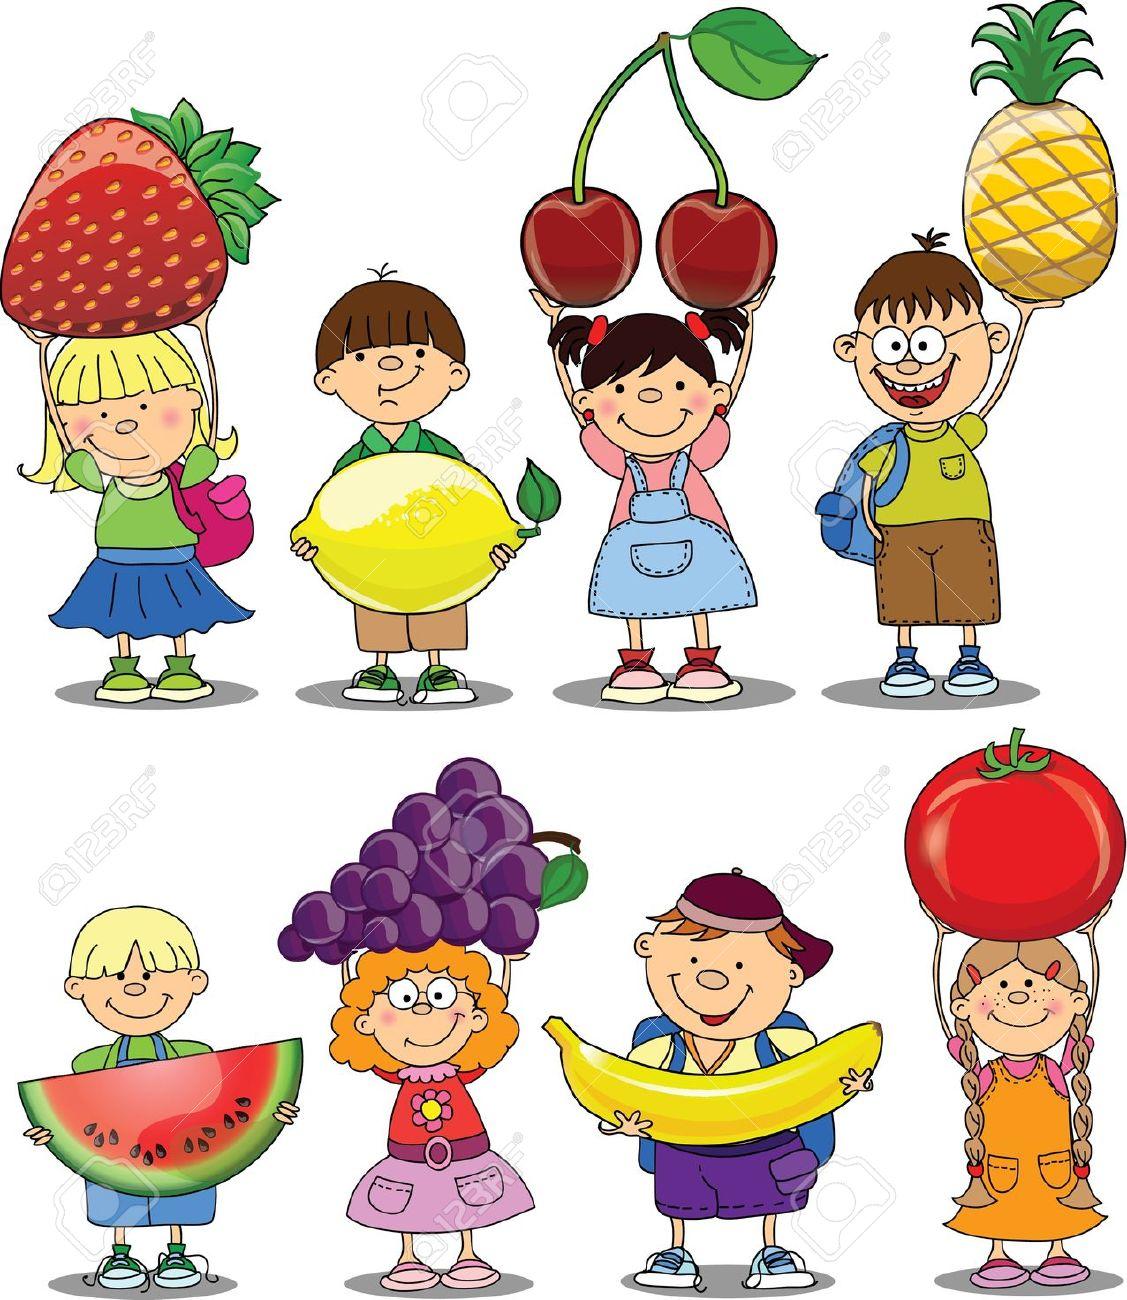 1127x1300 Fruits Amp Vegetables Clipart Kid Vegetable Garden